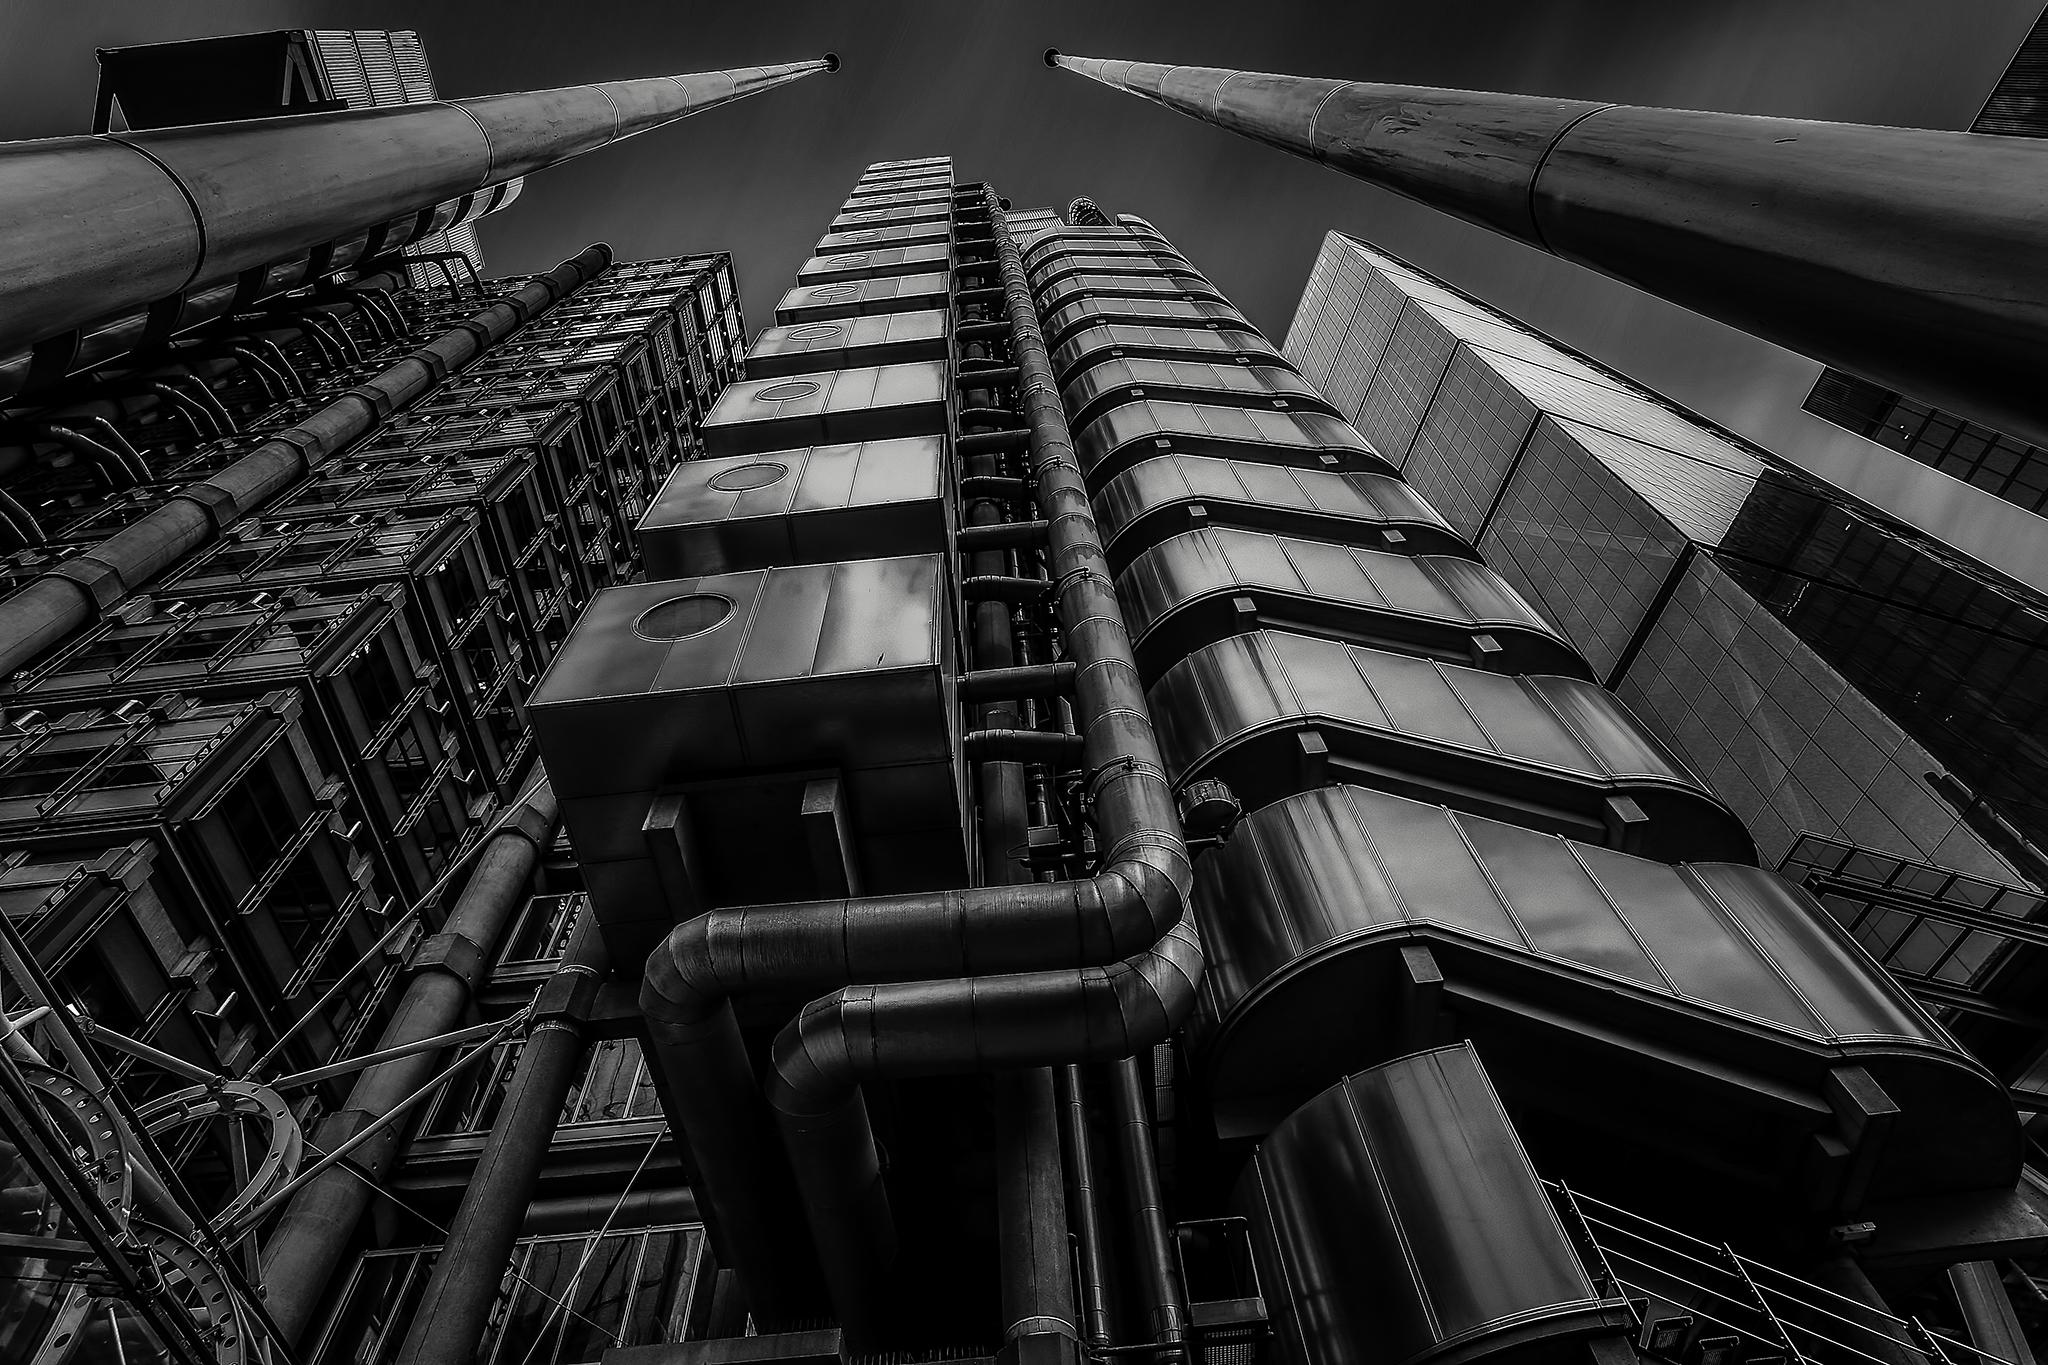 The Lloyds Building, United Kingdom